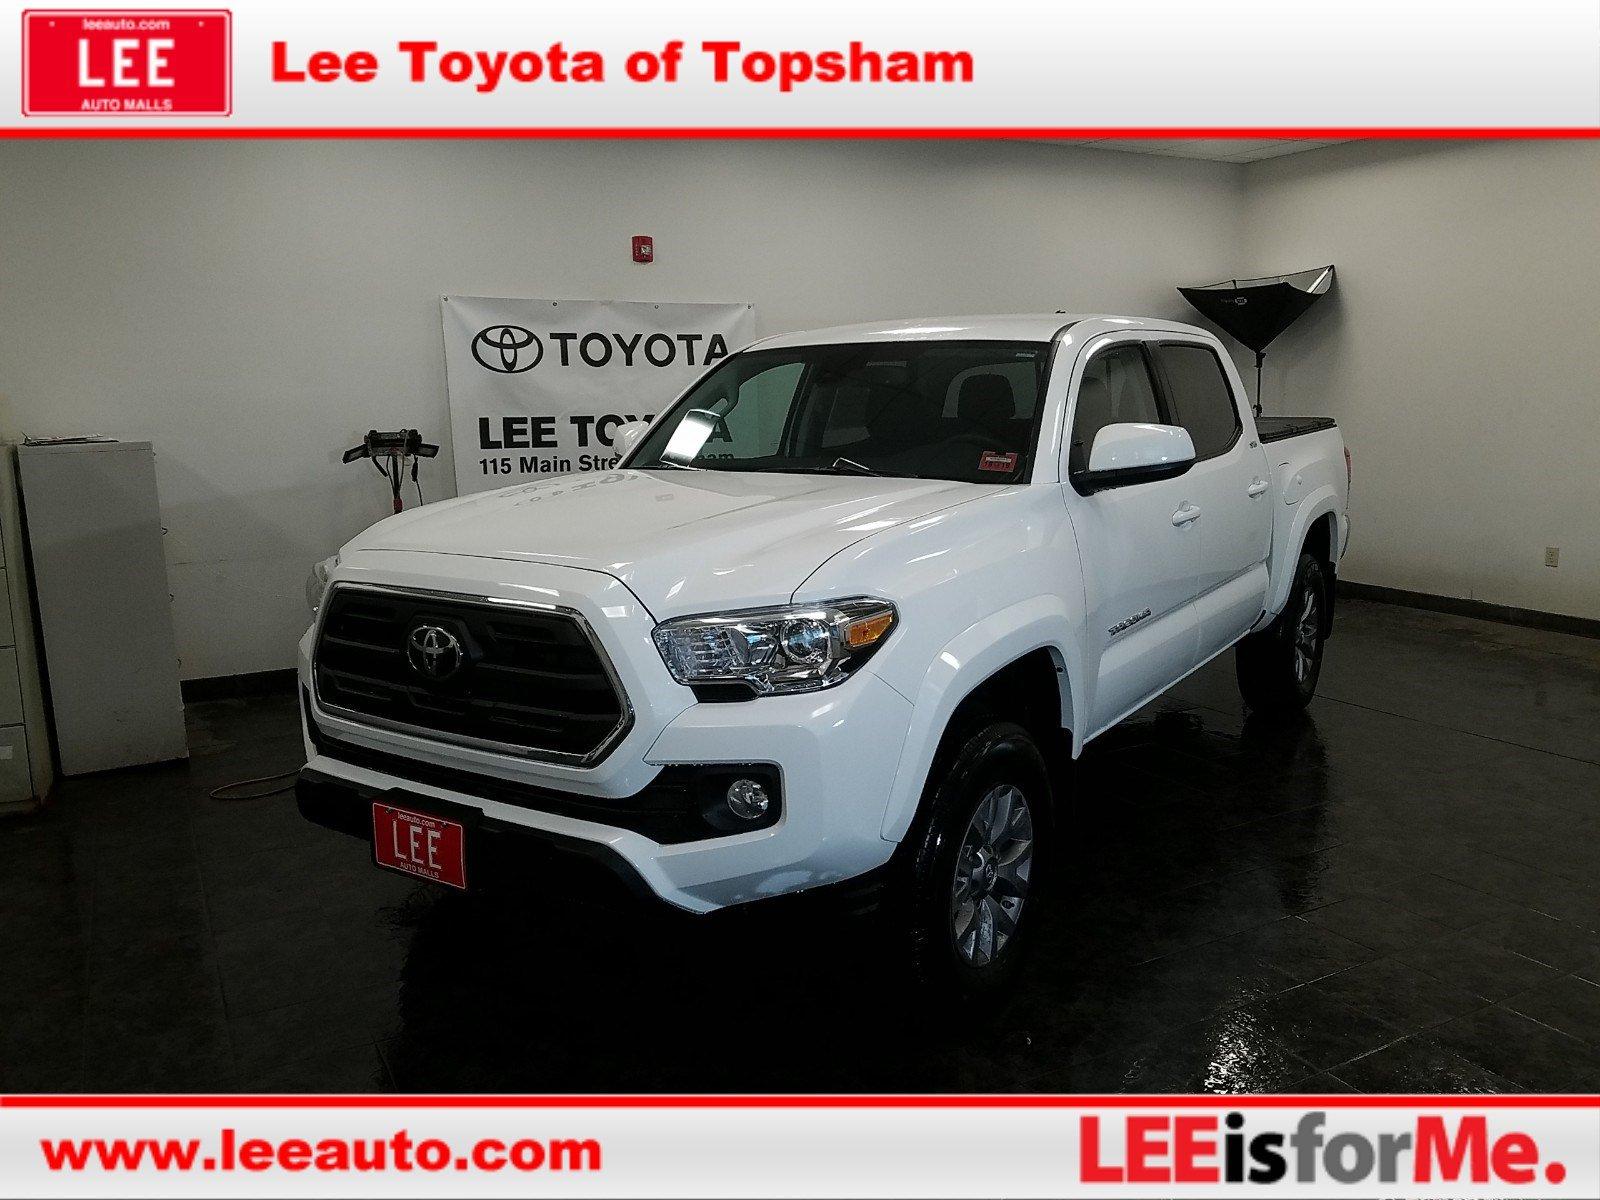 Lee Toyota Topsham Maine >> Maine Toyota Dealer | Lee Toyota of Topsham ME | New & Used Toyota Maine